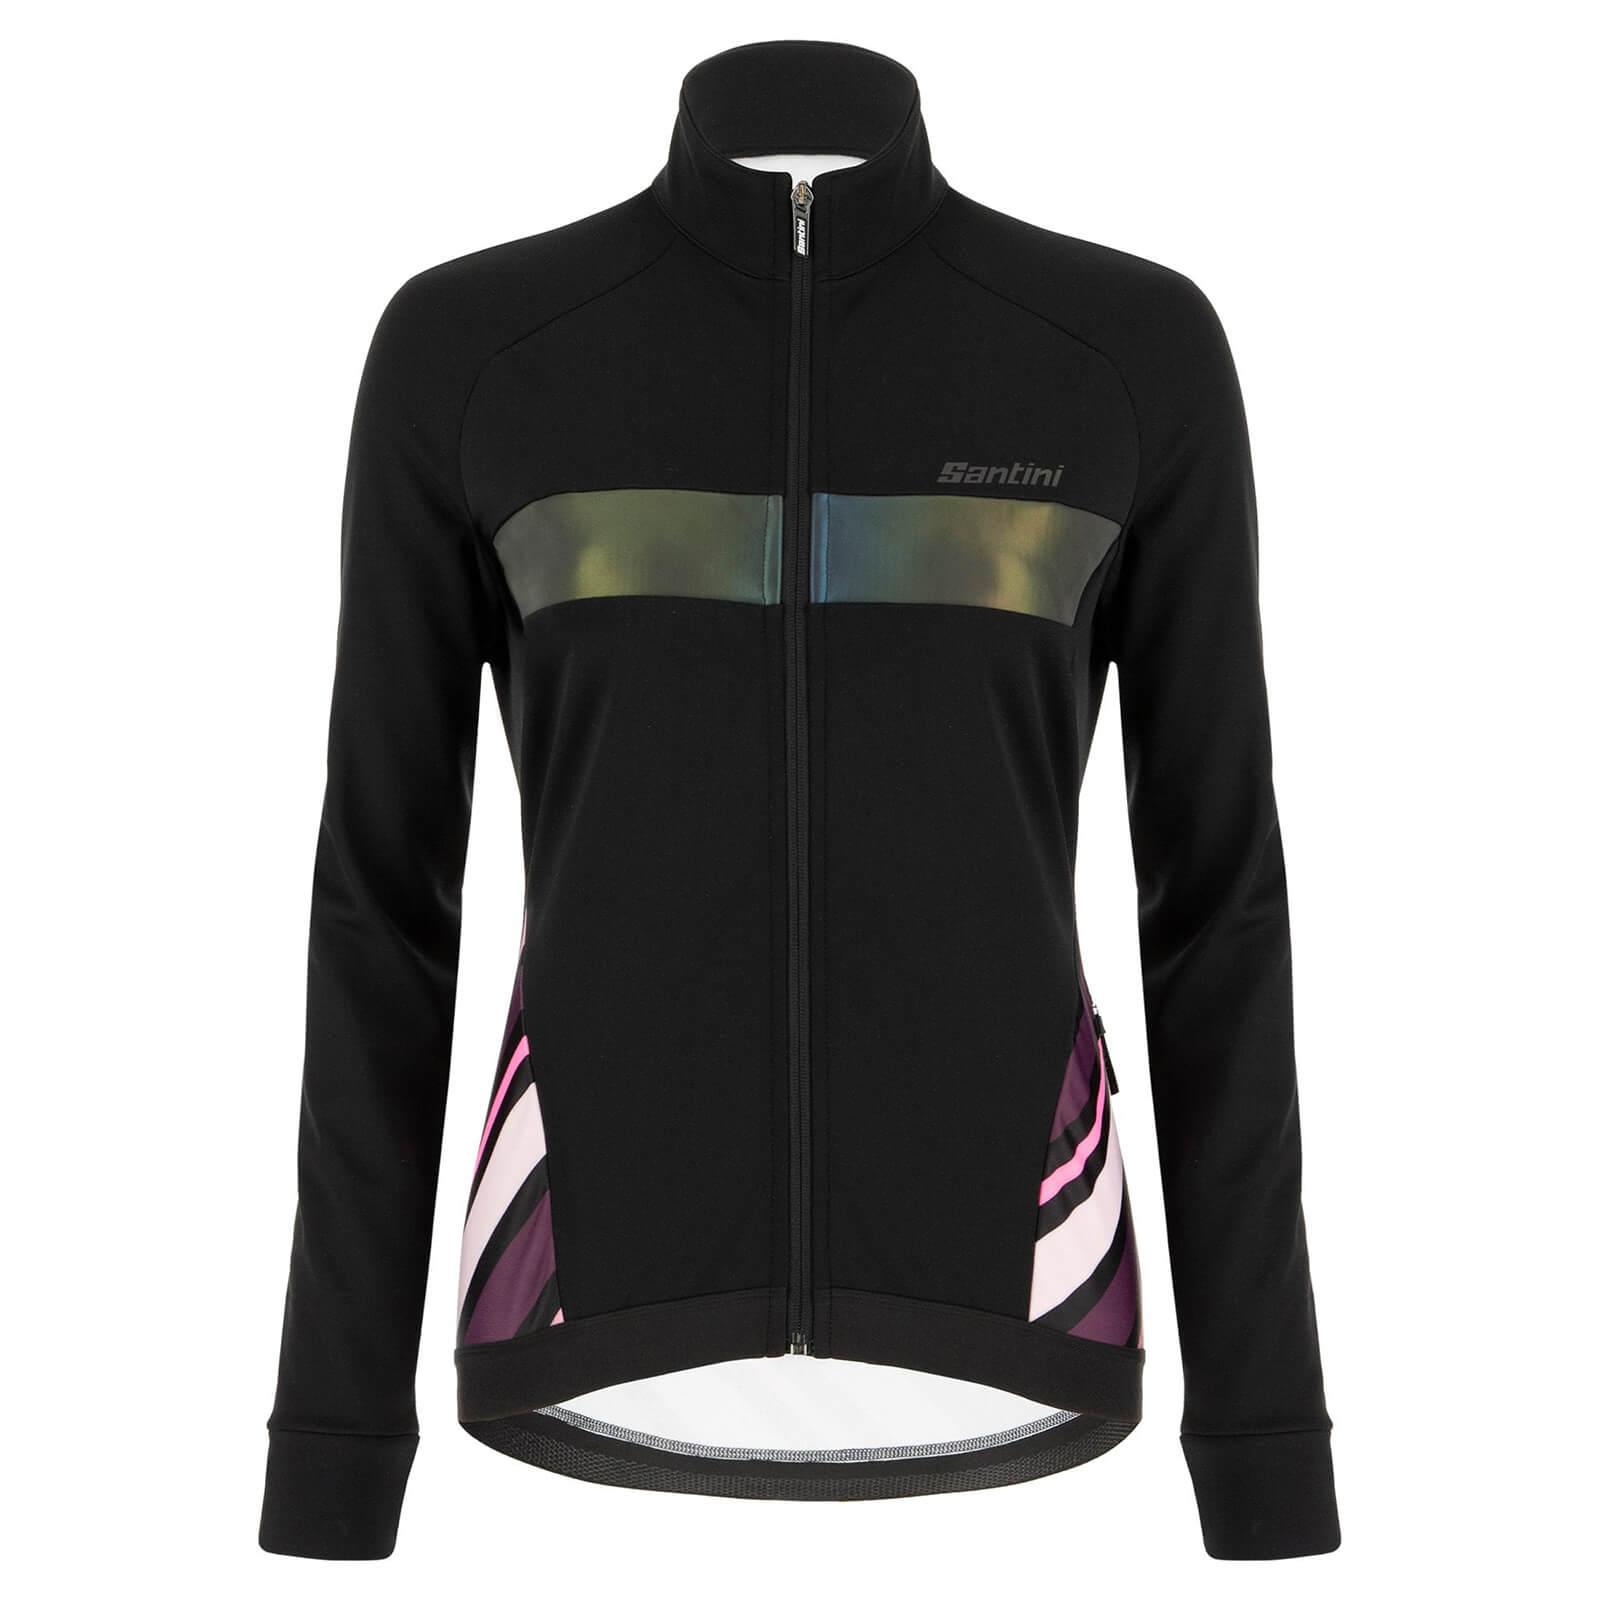 Santini Women's Coral Raggio Jacket - M - Black